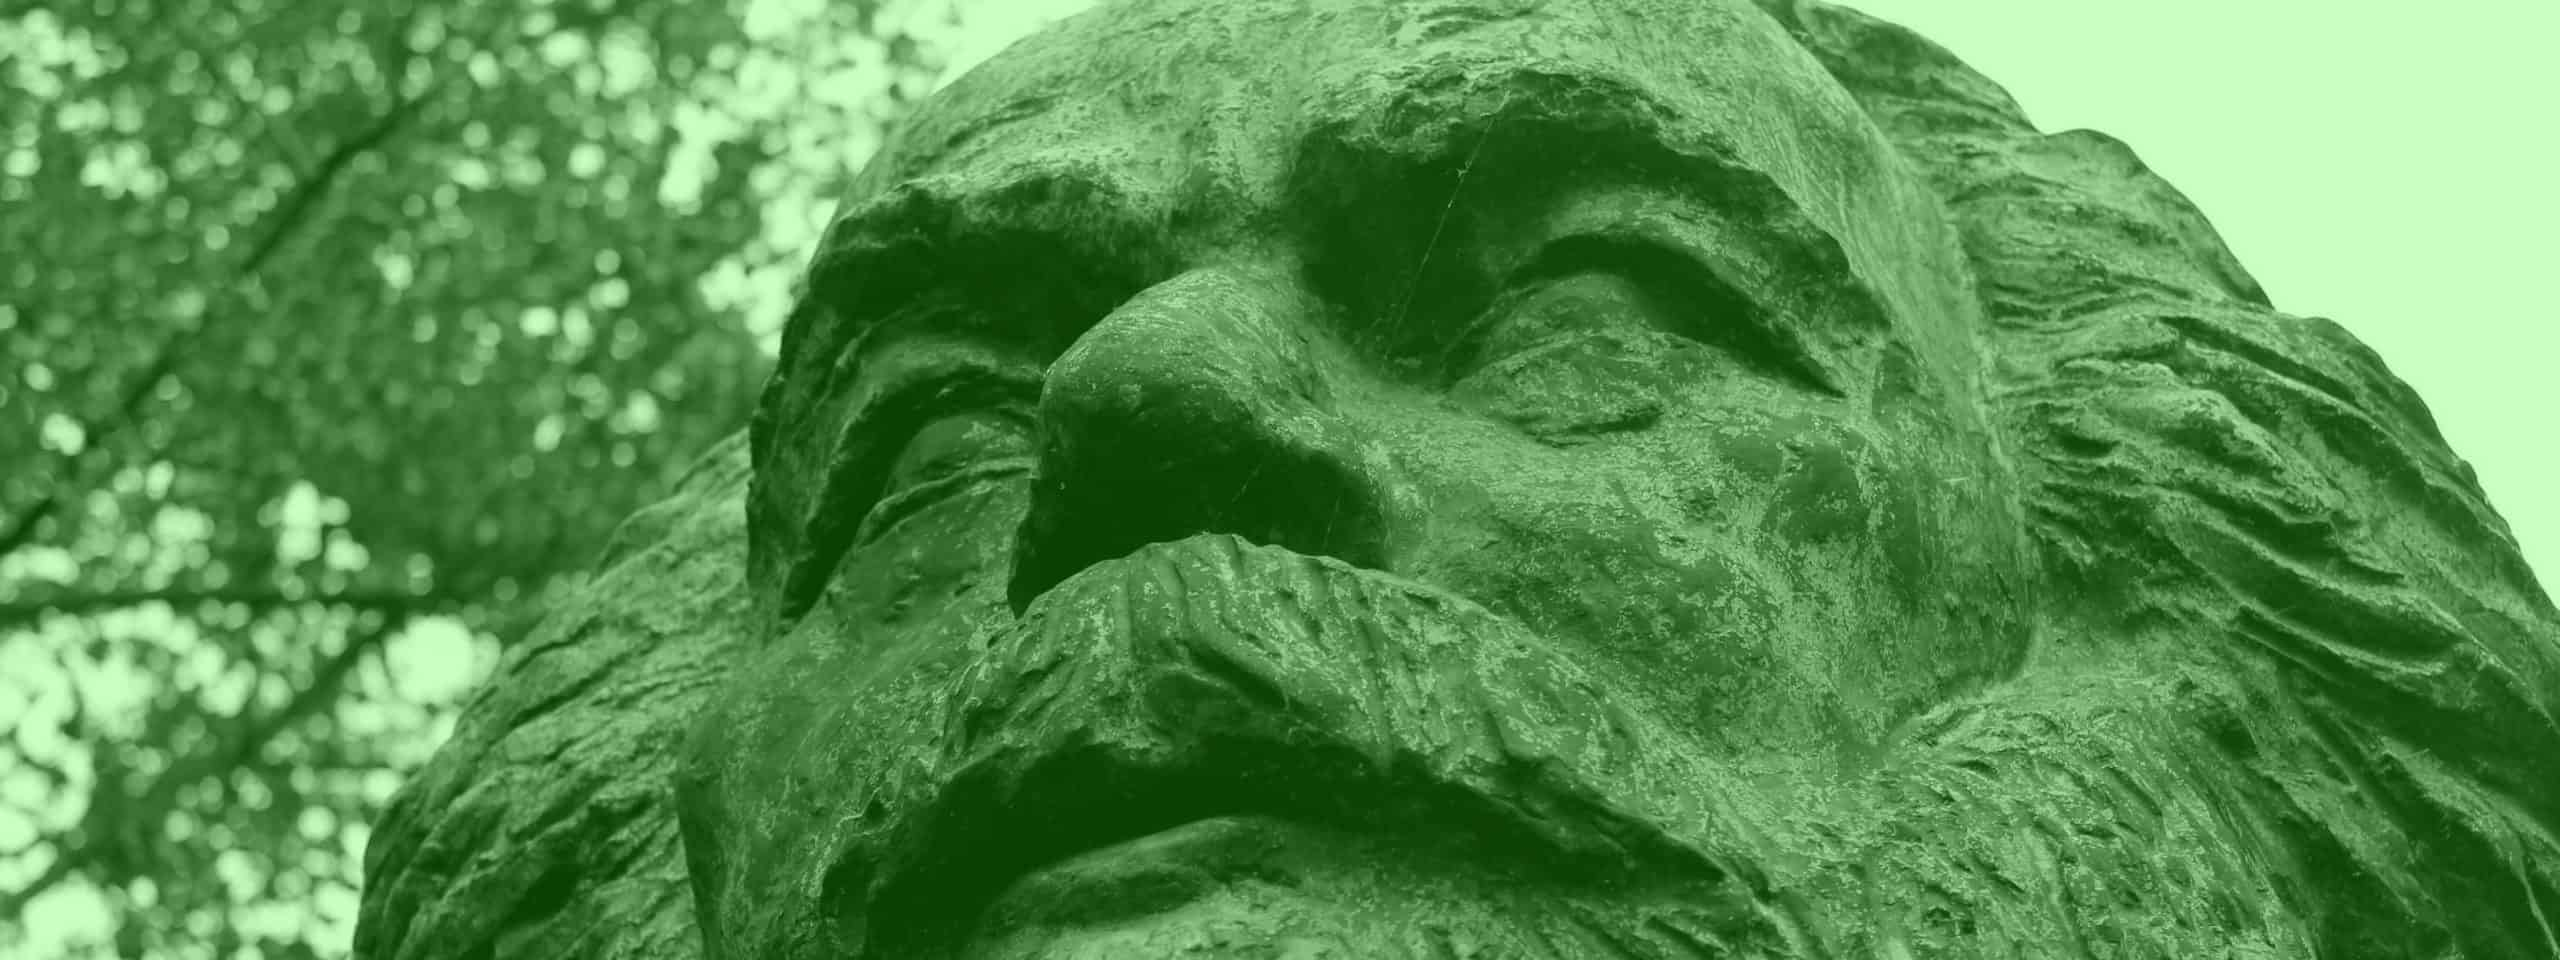 Grüner Kulturmarxismus